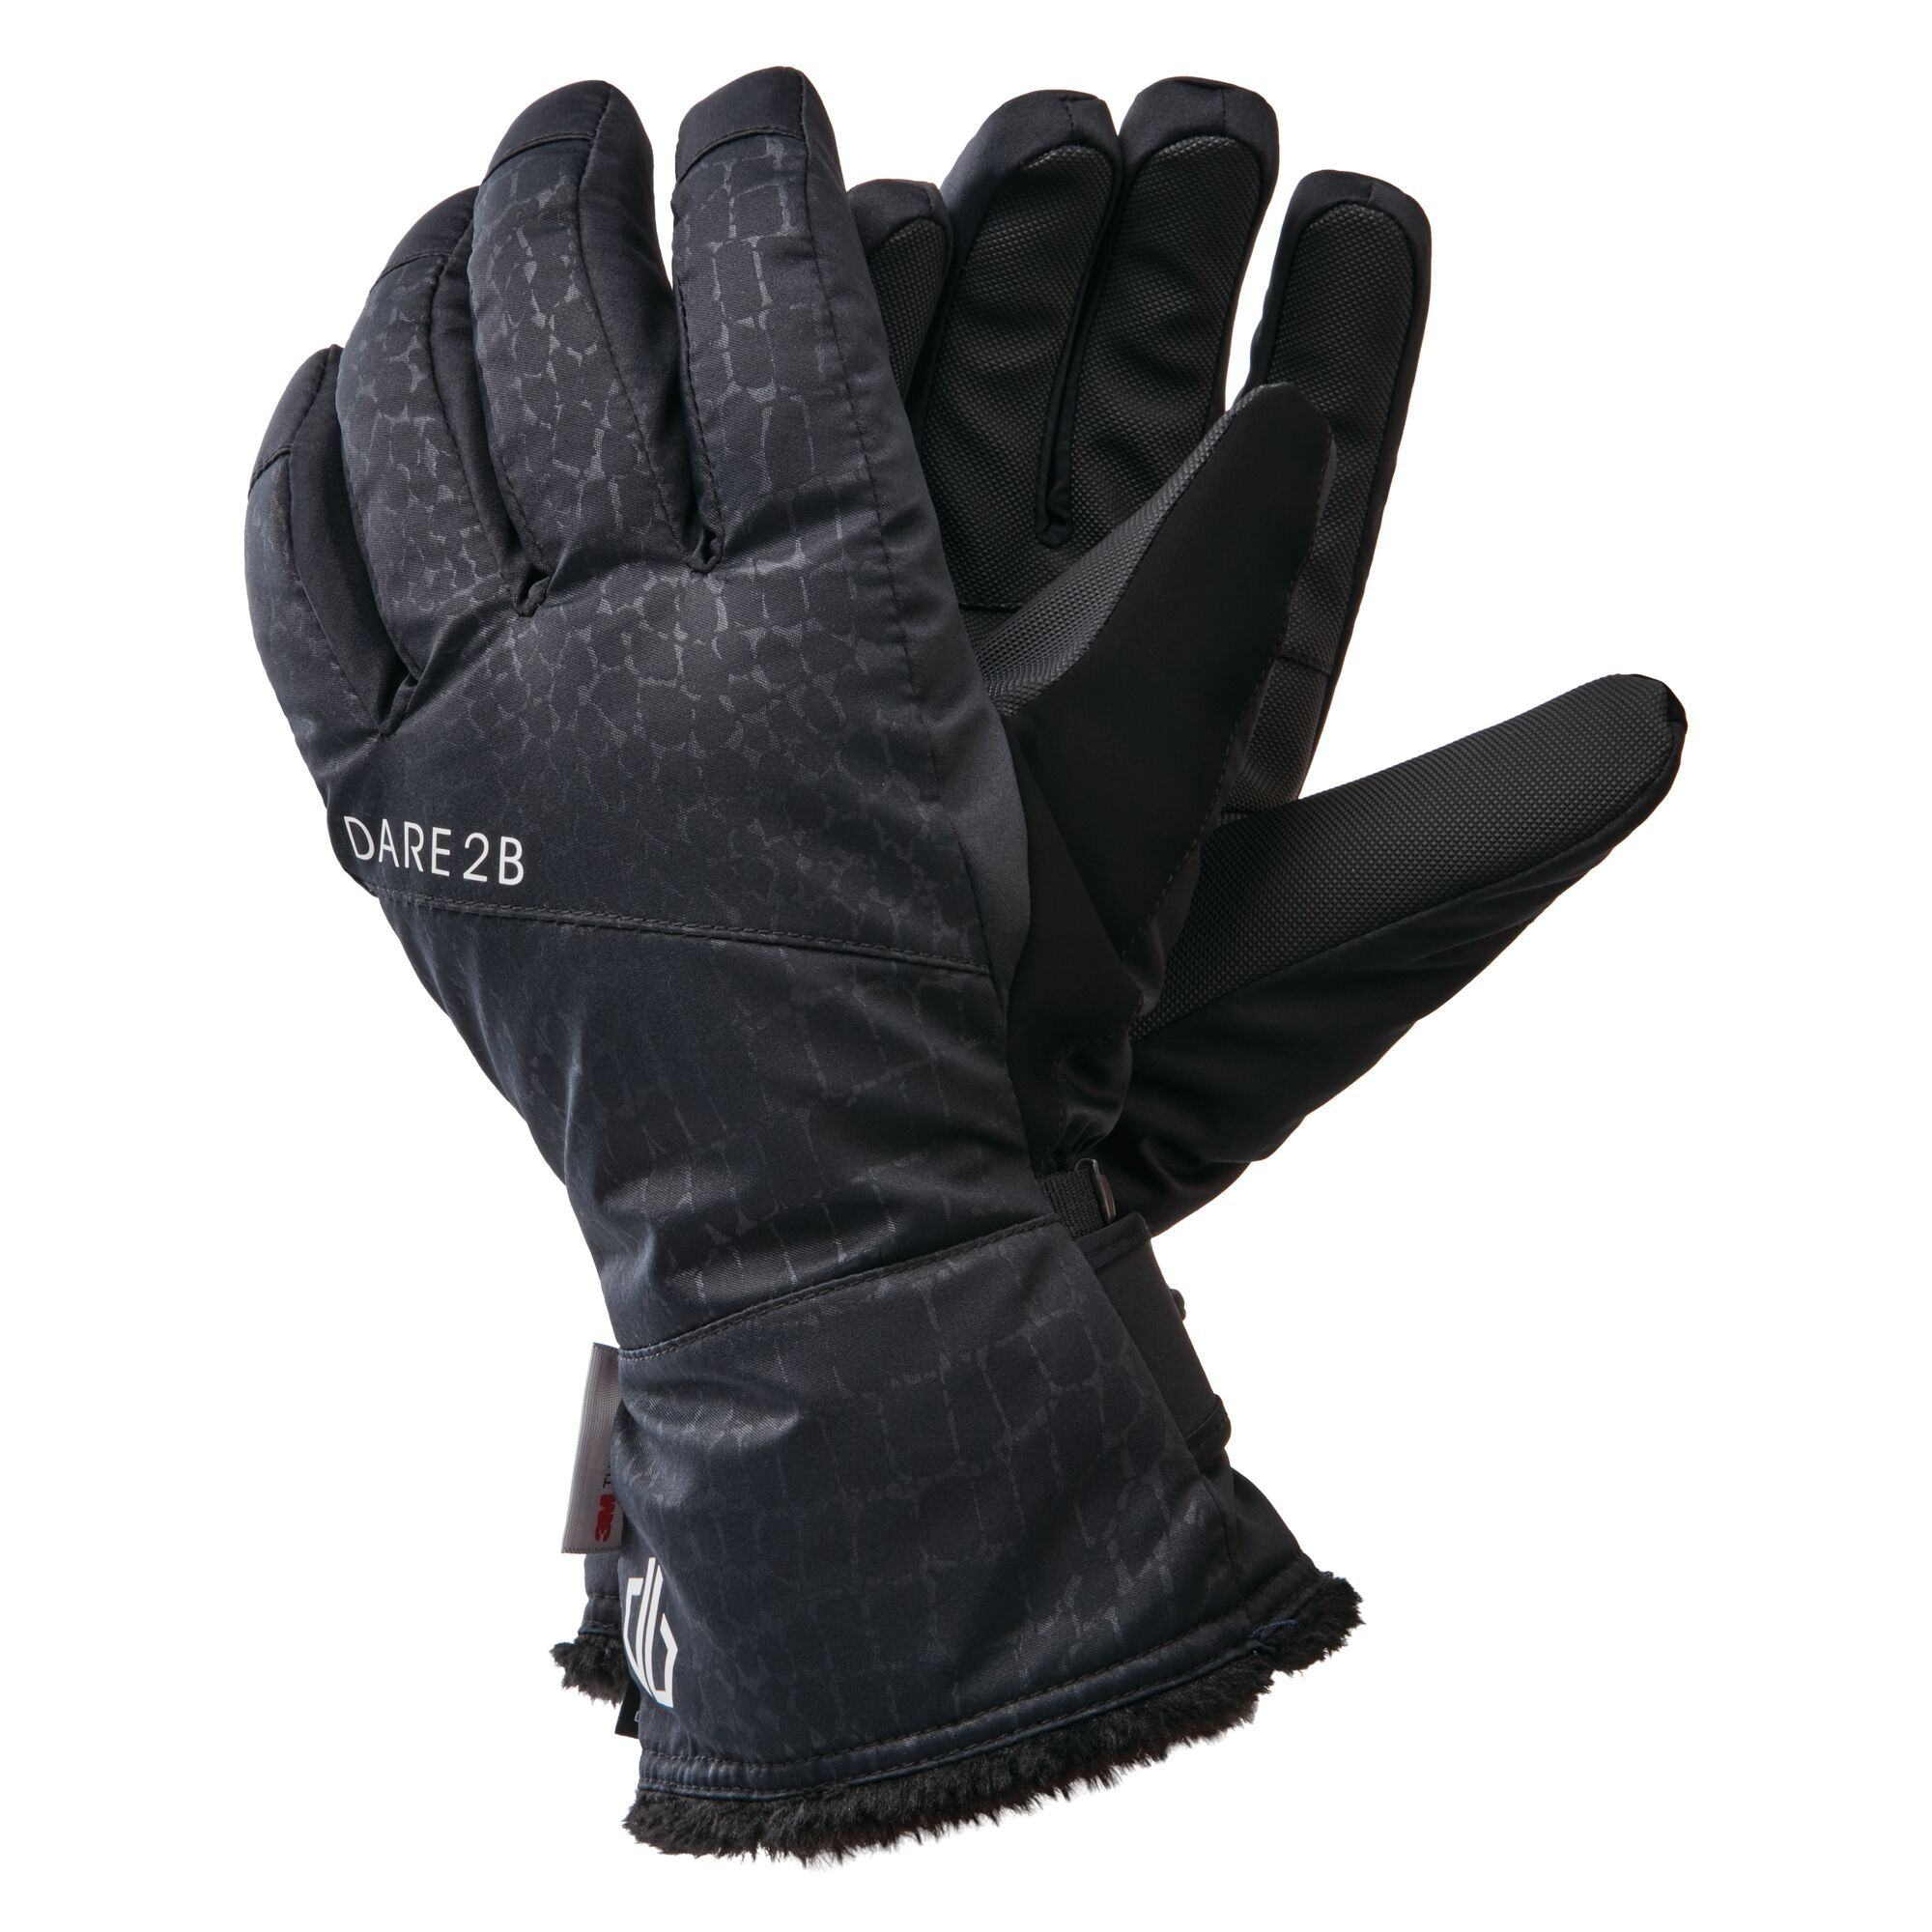 Mănuși Ski & Snow -  dare2b ICEBERG Waterproof Insulated Ski Gloves